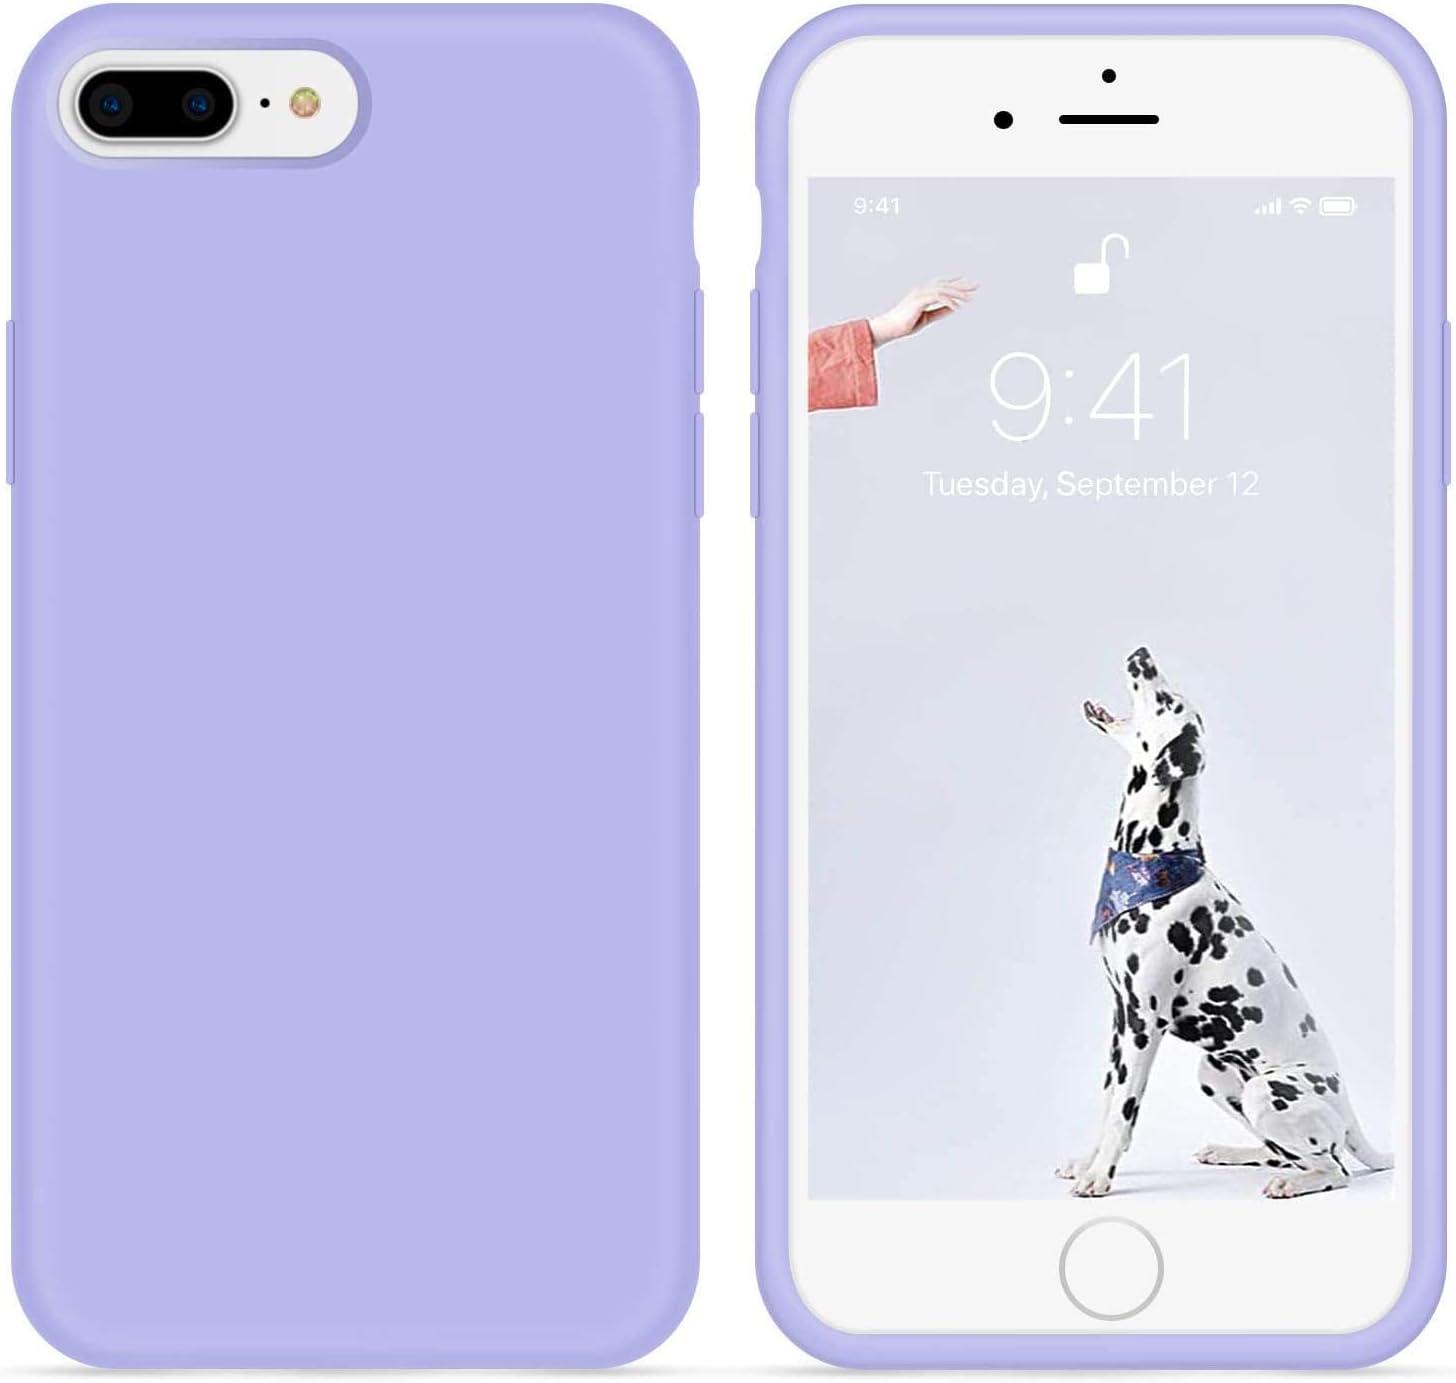 NYGSM Case for iPhone 7 Plus/iPhone 8 Plus case Liquid Silicone Gel Rubber Phone Case,Phone 7 Plus/iPhone 8 Plus 5.5 Inch Full Body Slim Soft Microfiber Lining Protective Case (Lilac, Light Purple)